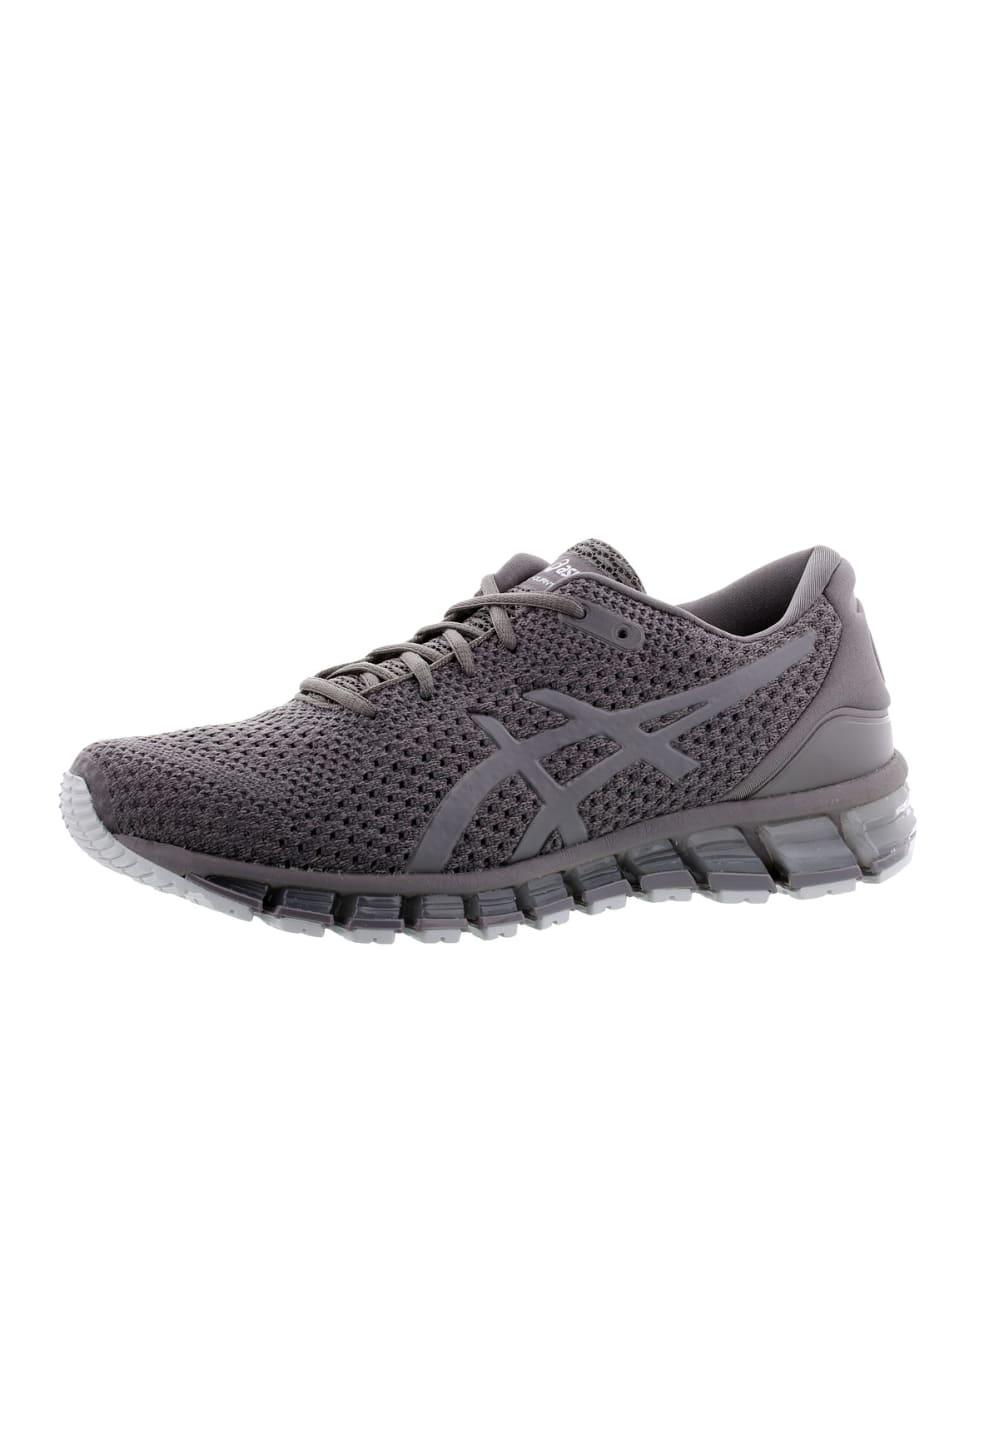 ASICS GEL Quantum 360 Knit 2 Chaussures running pour Homme Gris